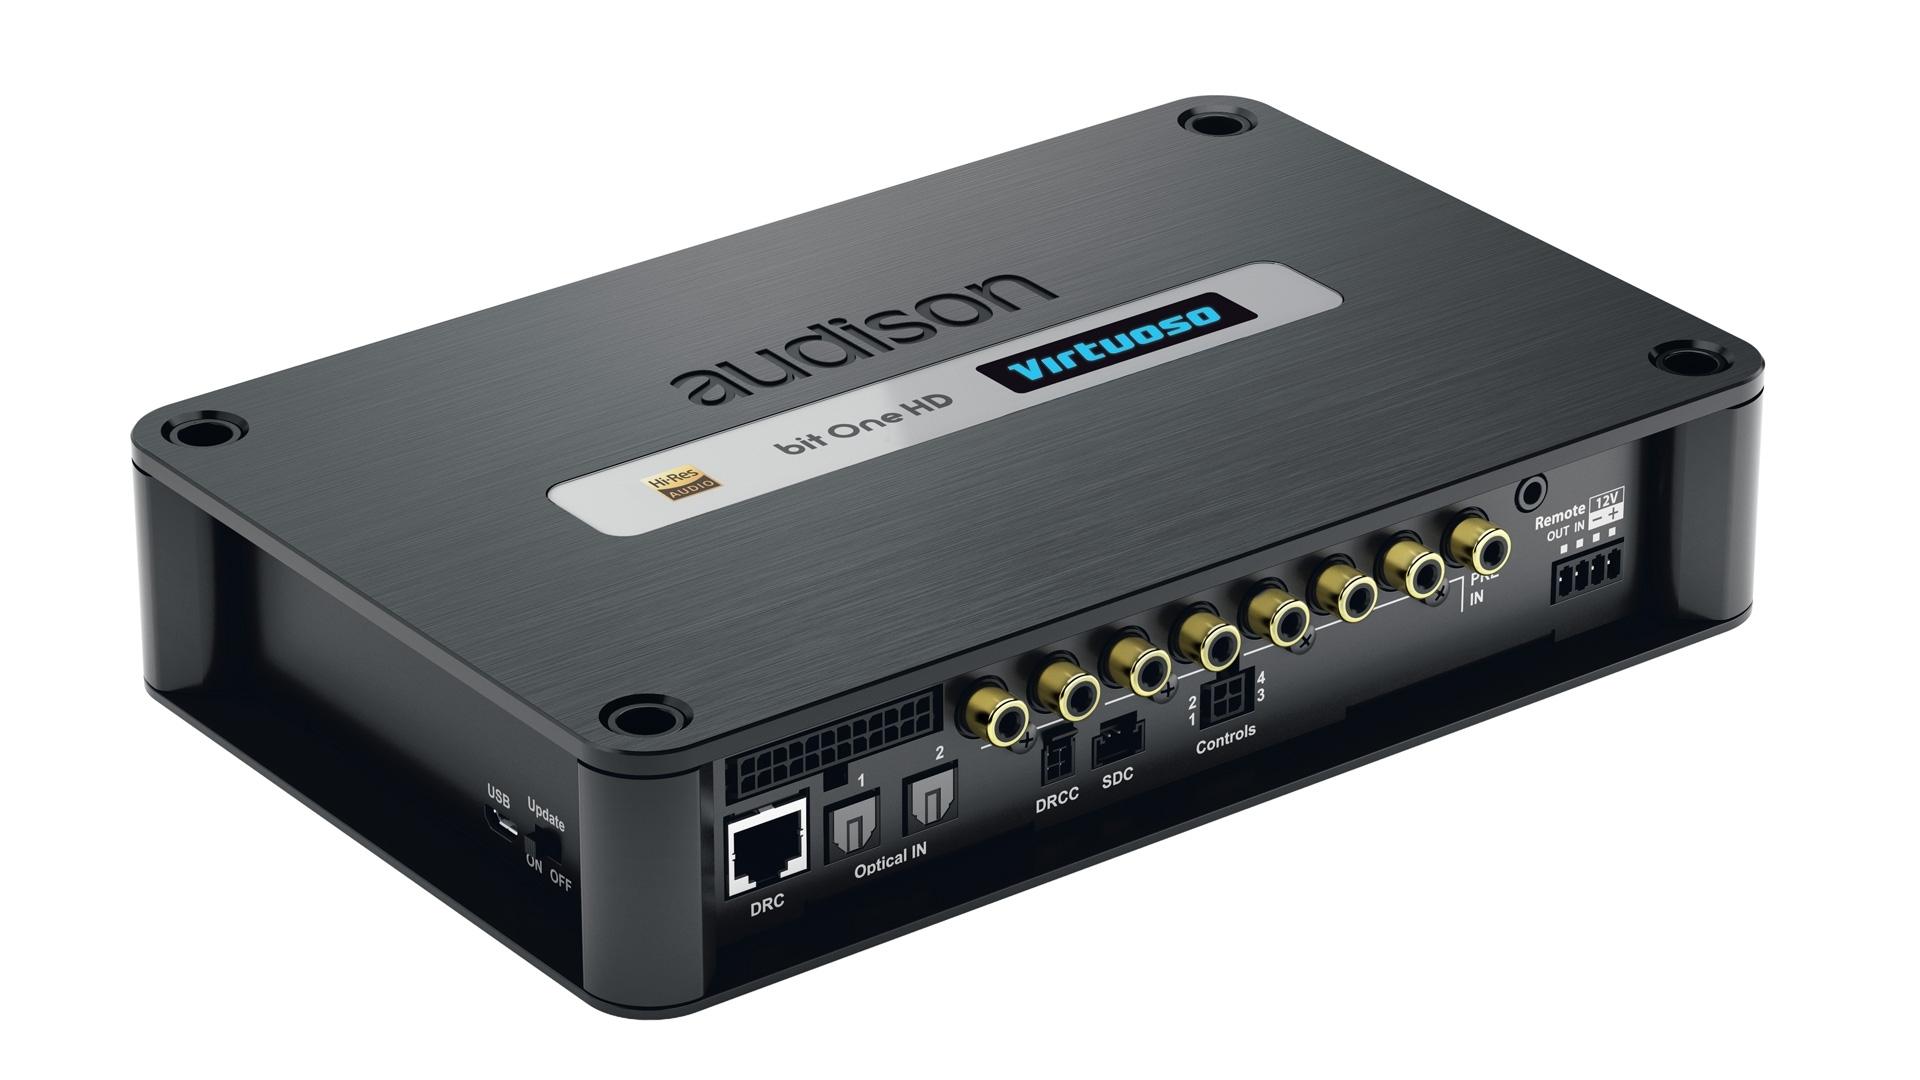 Audison bit One HD Virtuoso HI-RES SIGNAL PROCESSOR 13-Kanal High END DSP